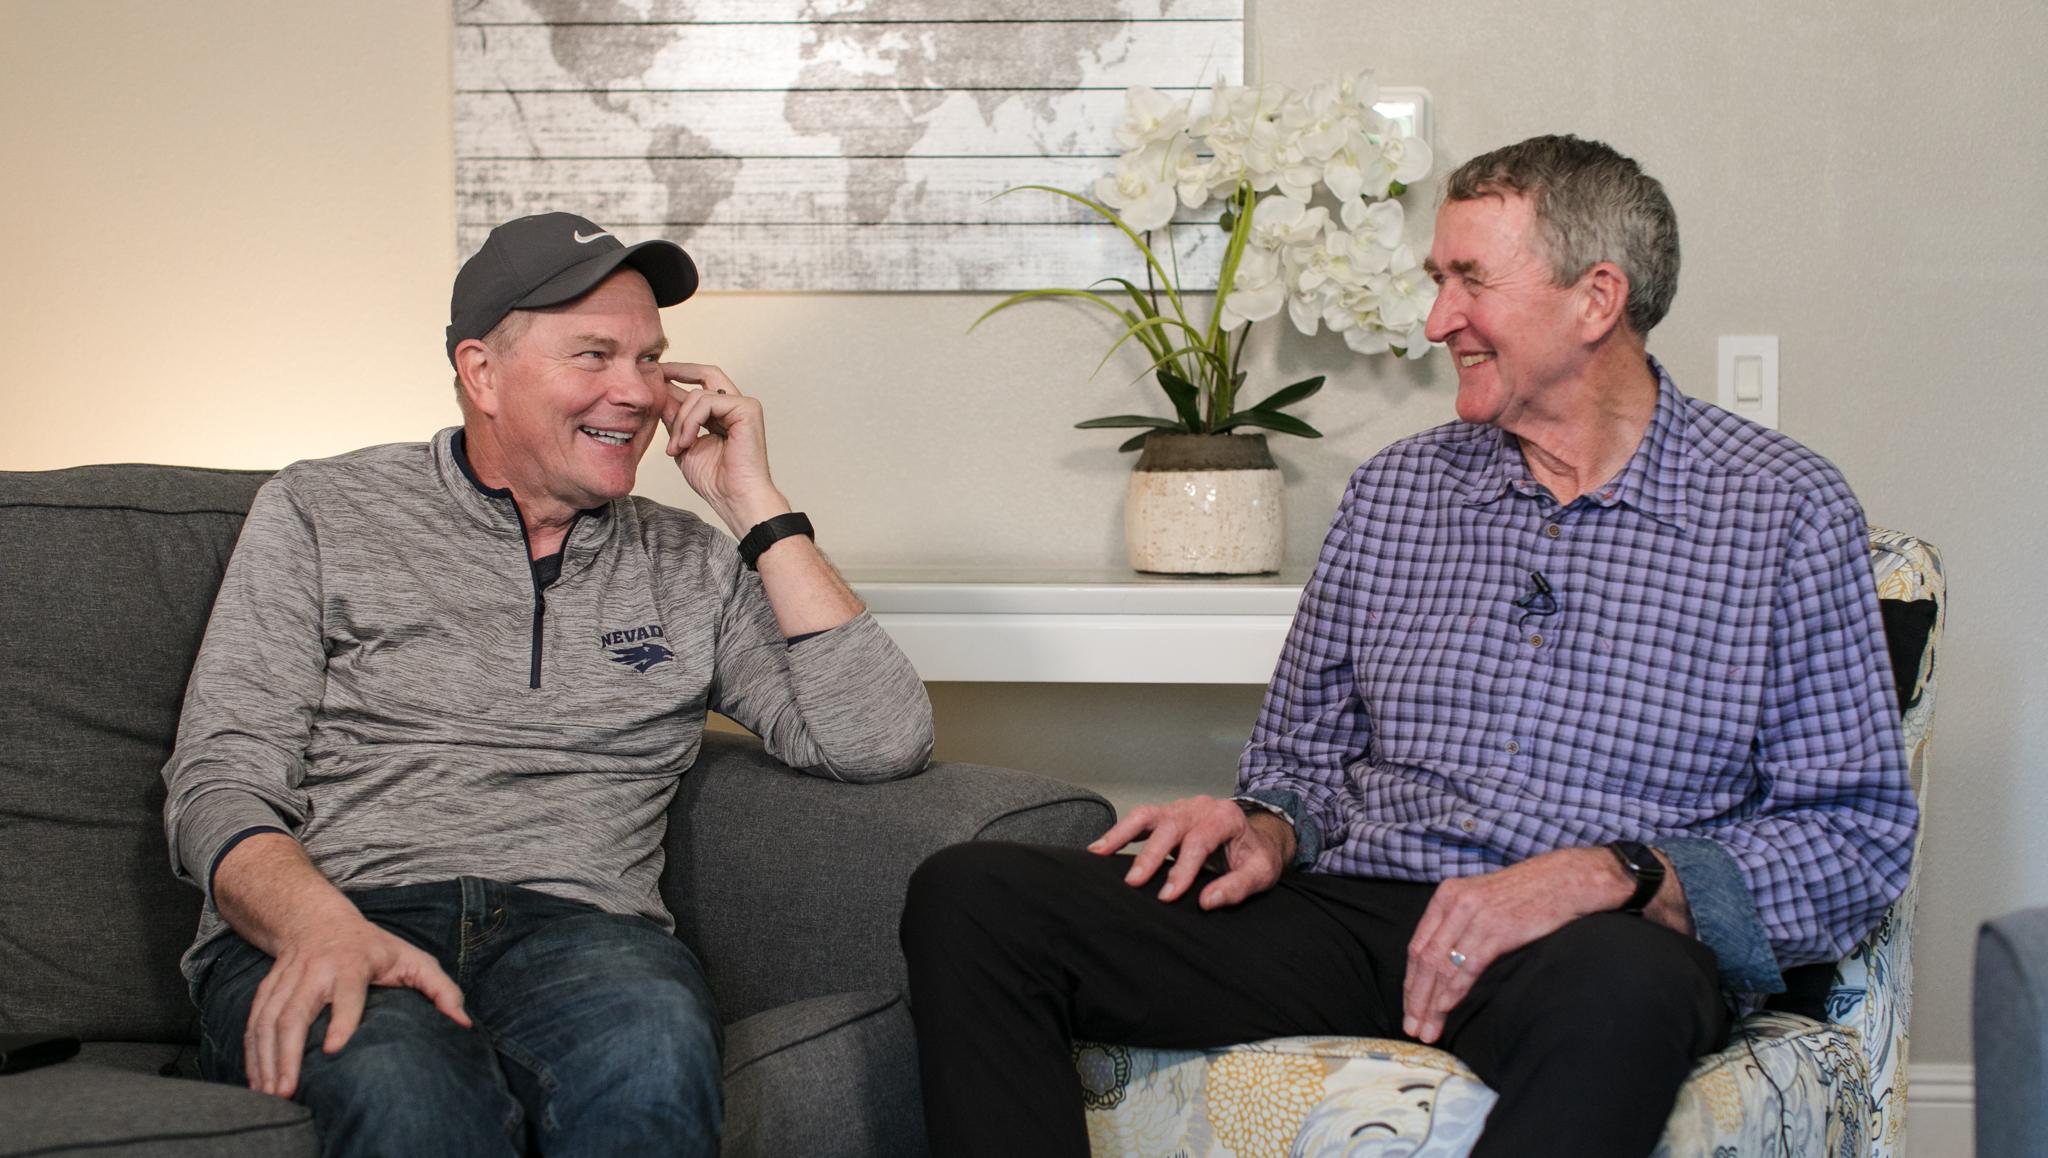 Steve & Phil